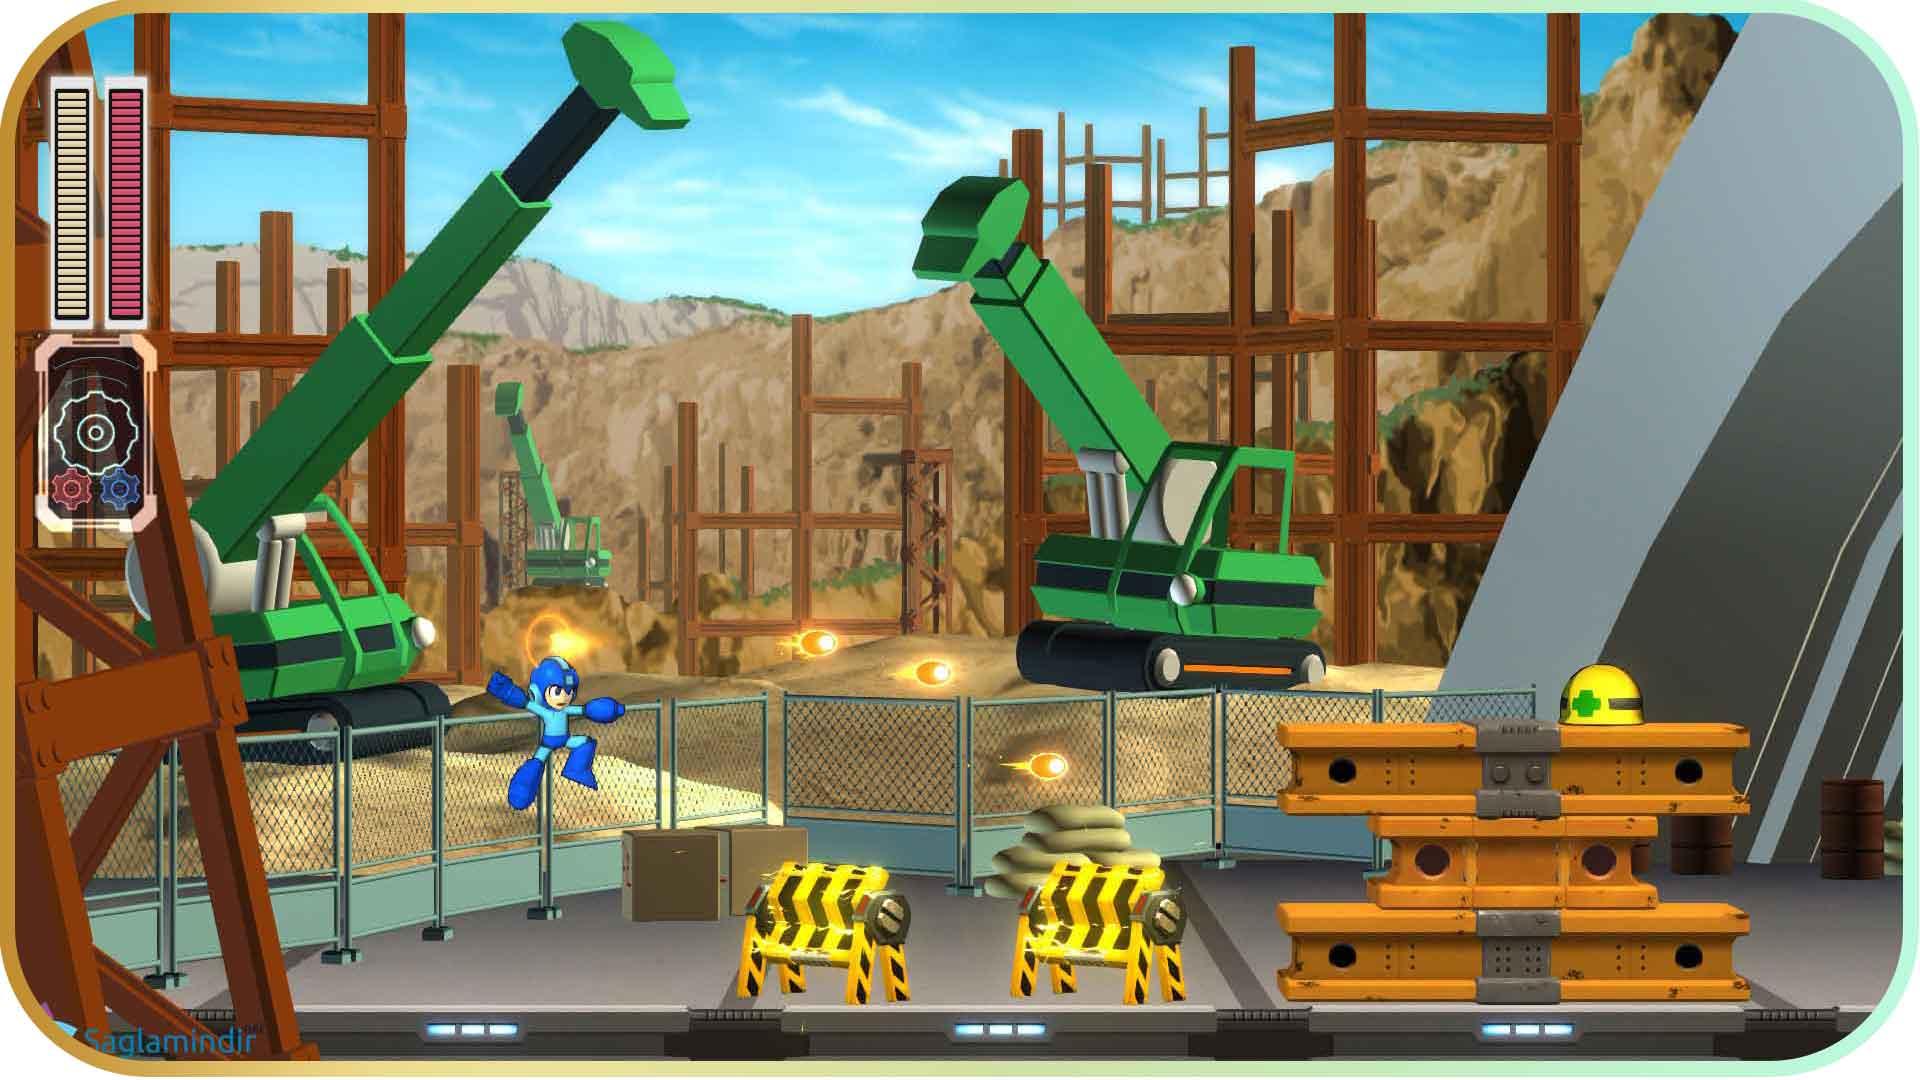 Mega Man saglamindir